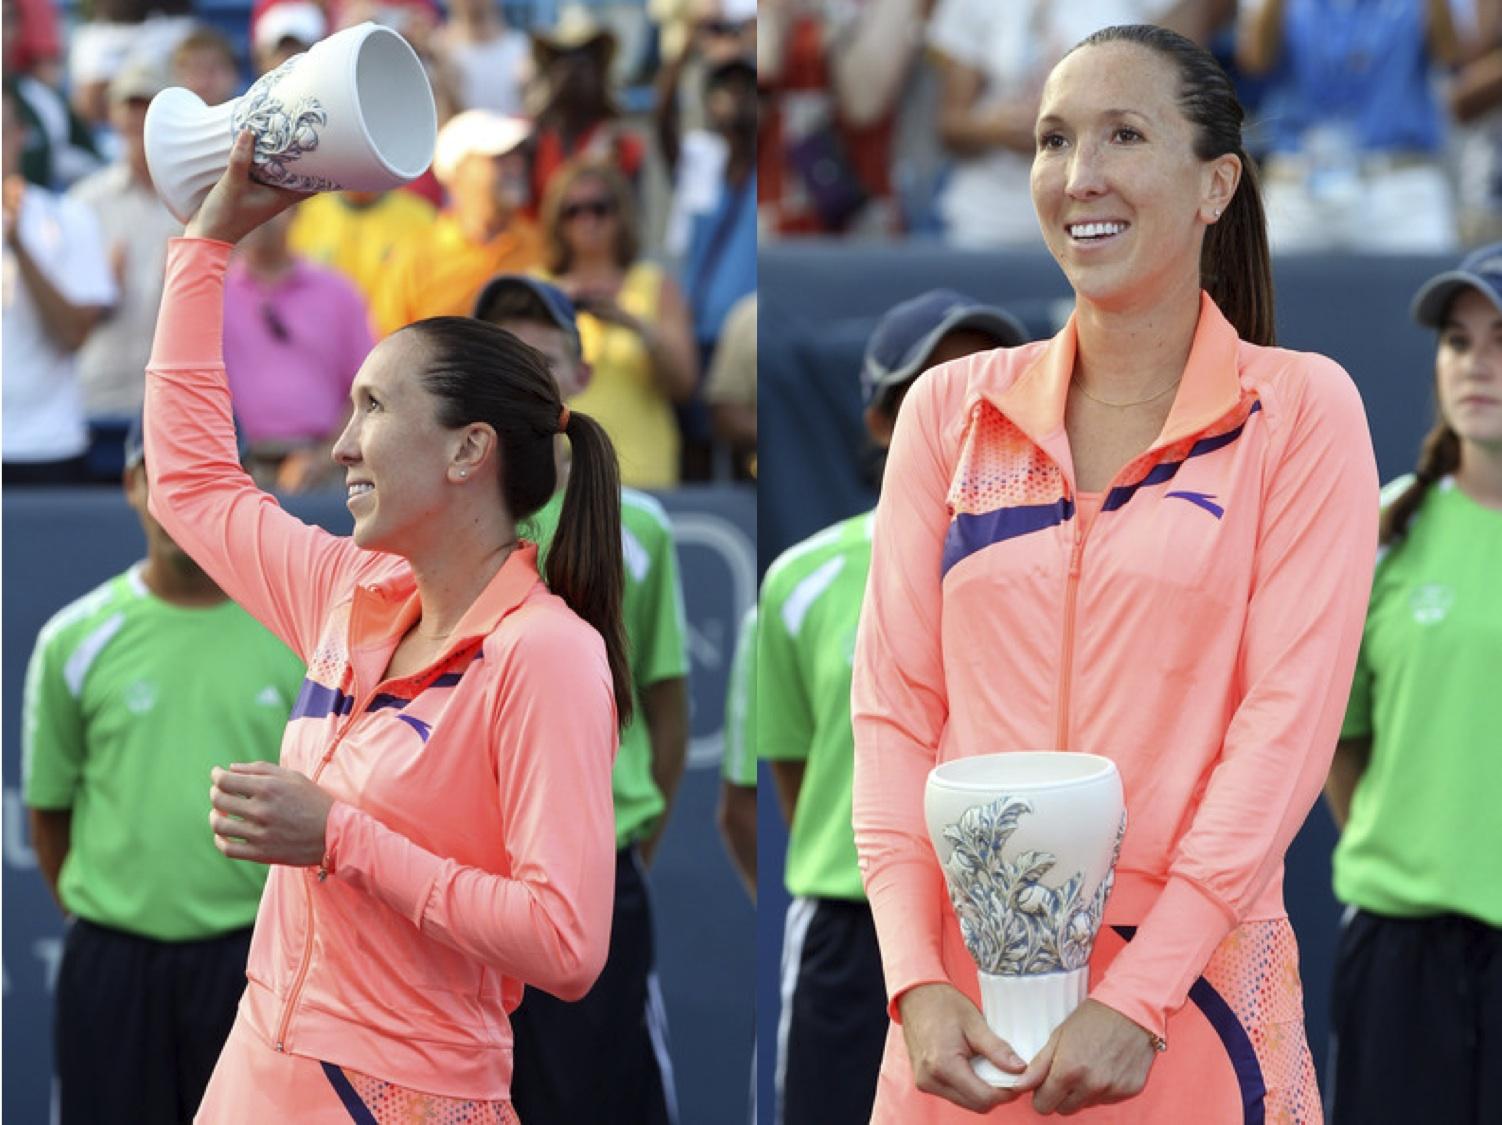 Ana Ivanovic Tennis Fashion Queen | d33blog